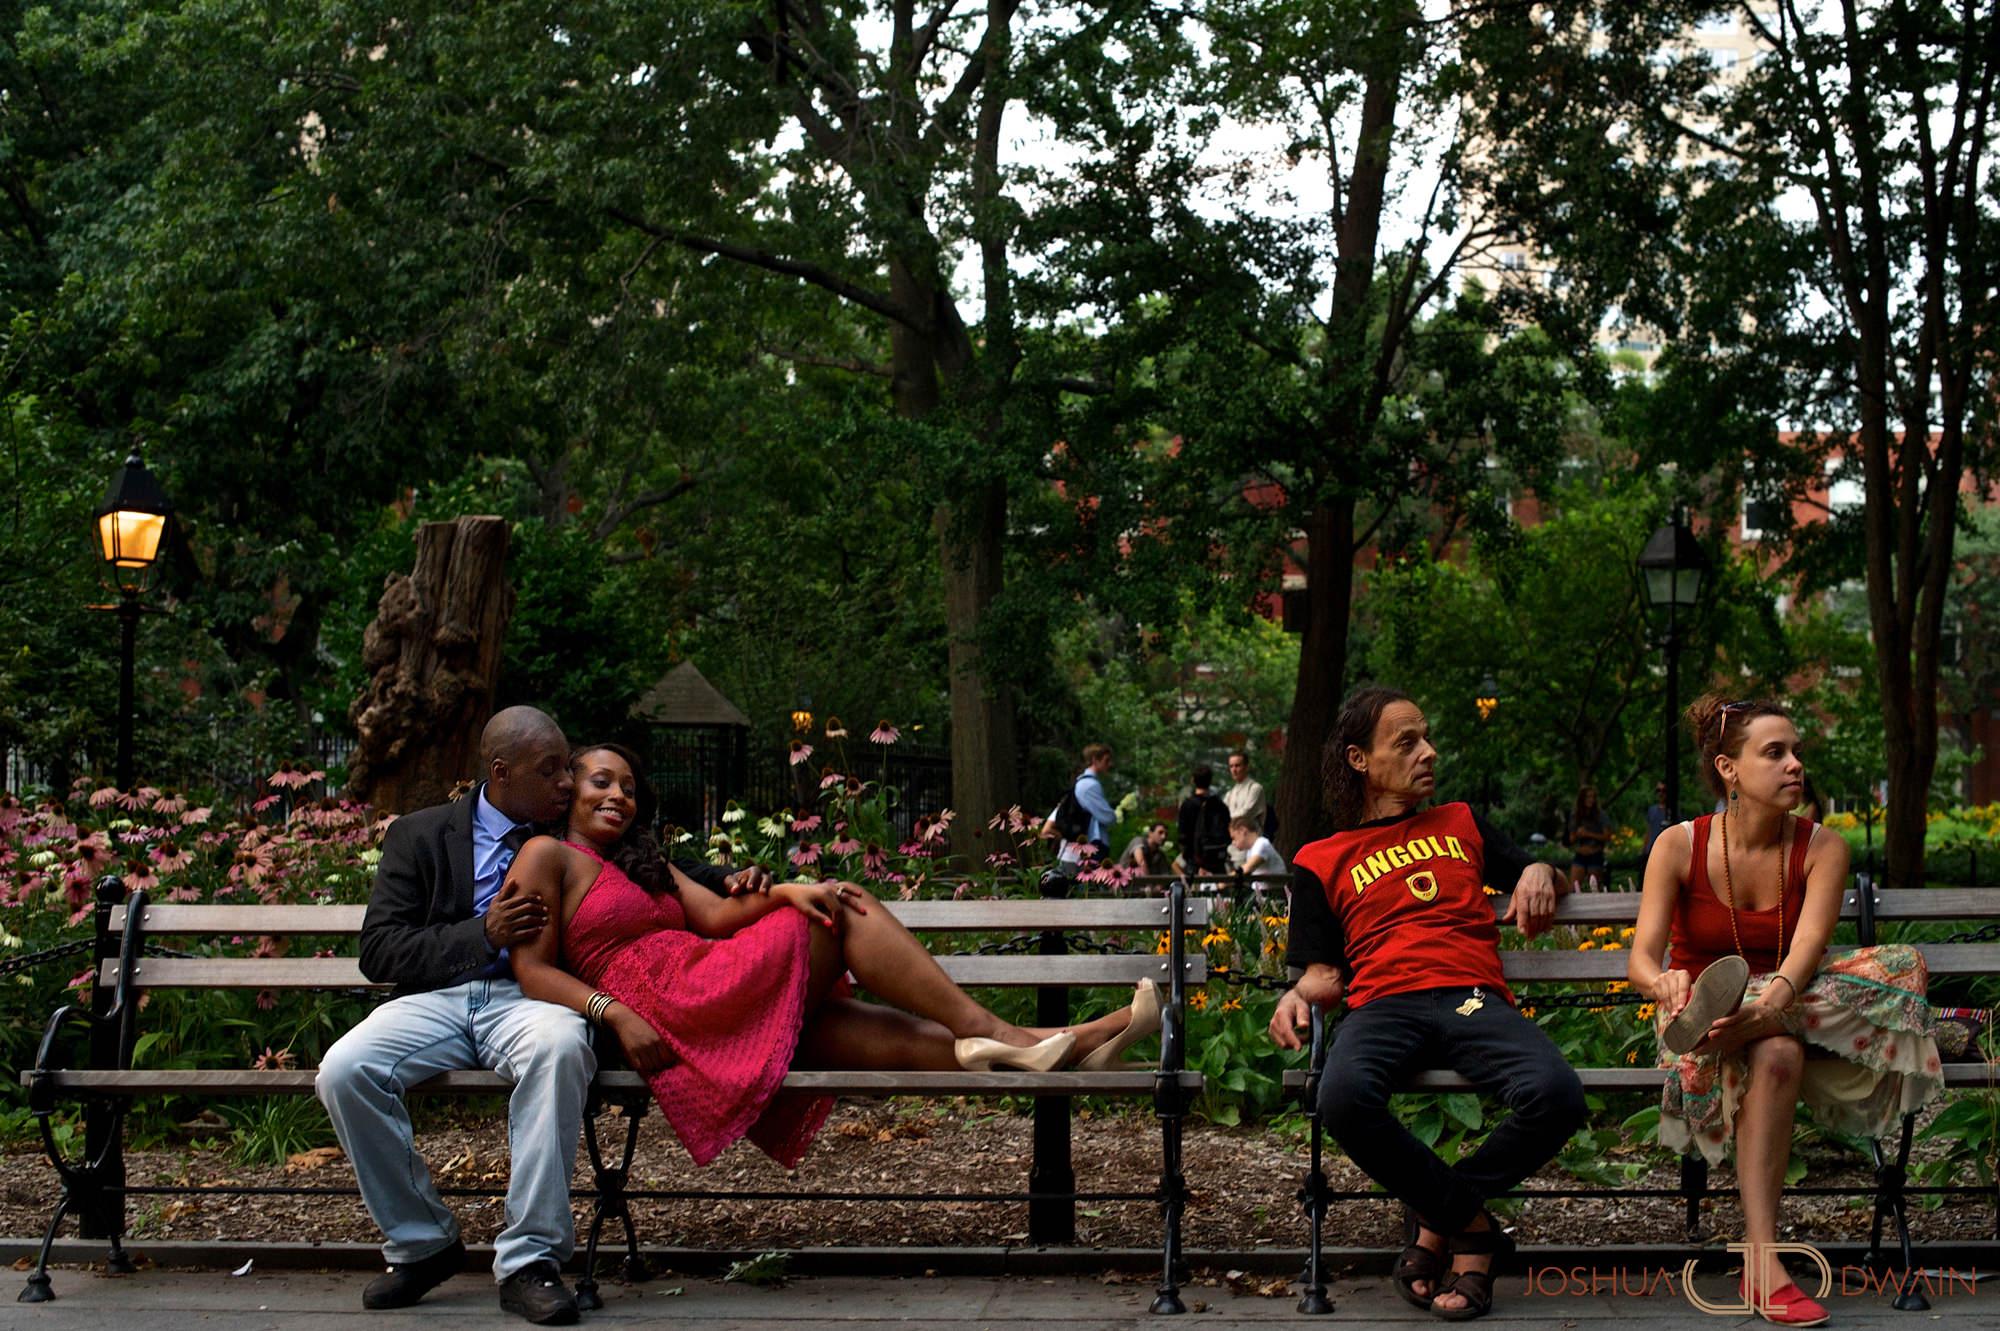 nadine-kindrick-006-lincoln-center-new-york-ny-engagement-photographer-joshua-dwain-2013-08-02_NK_042